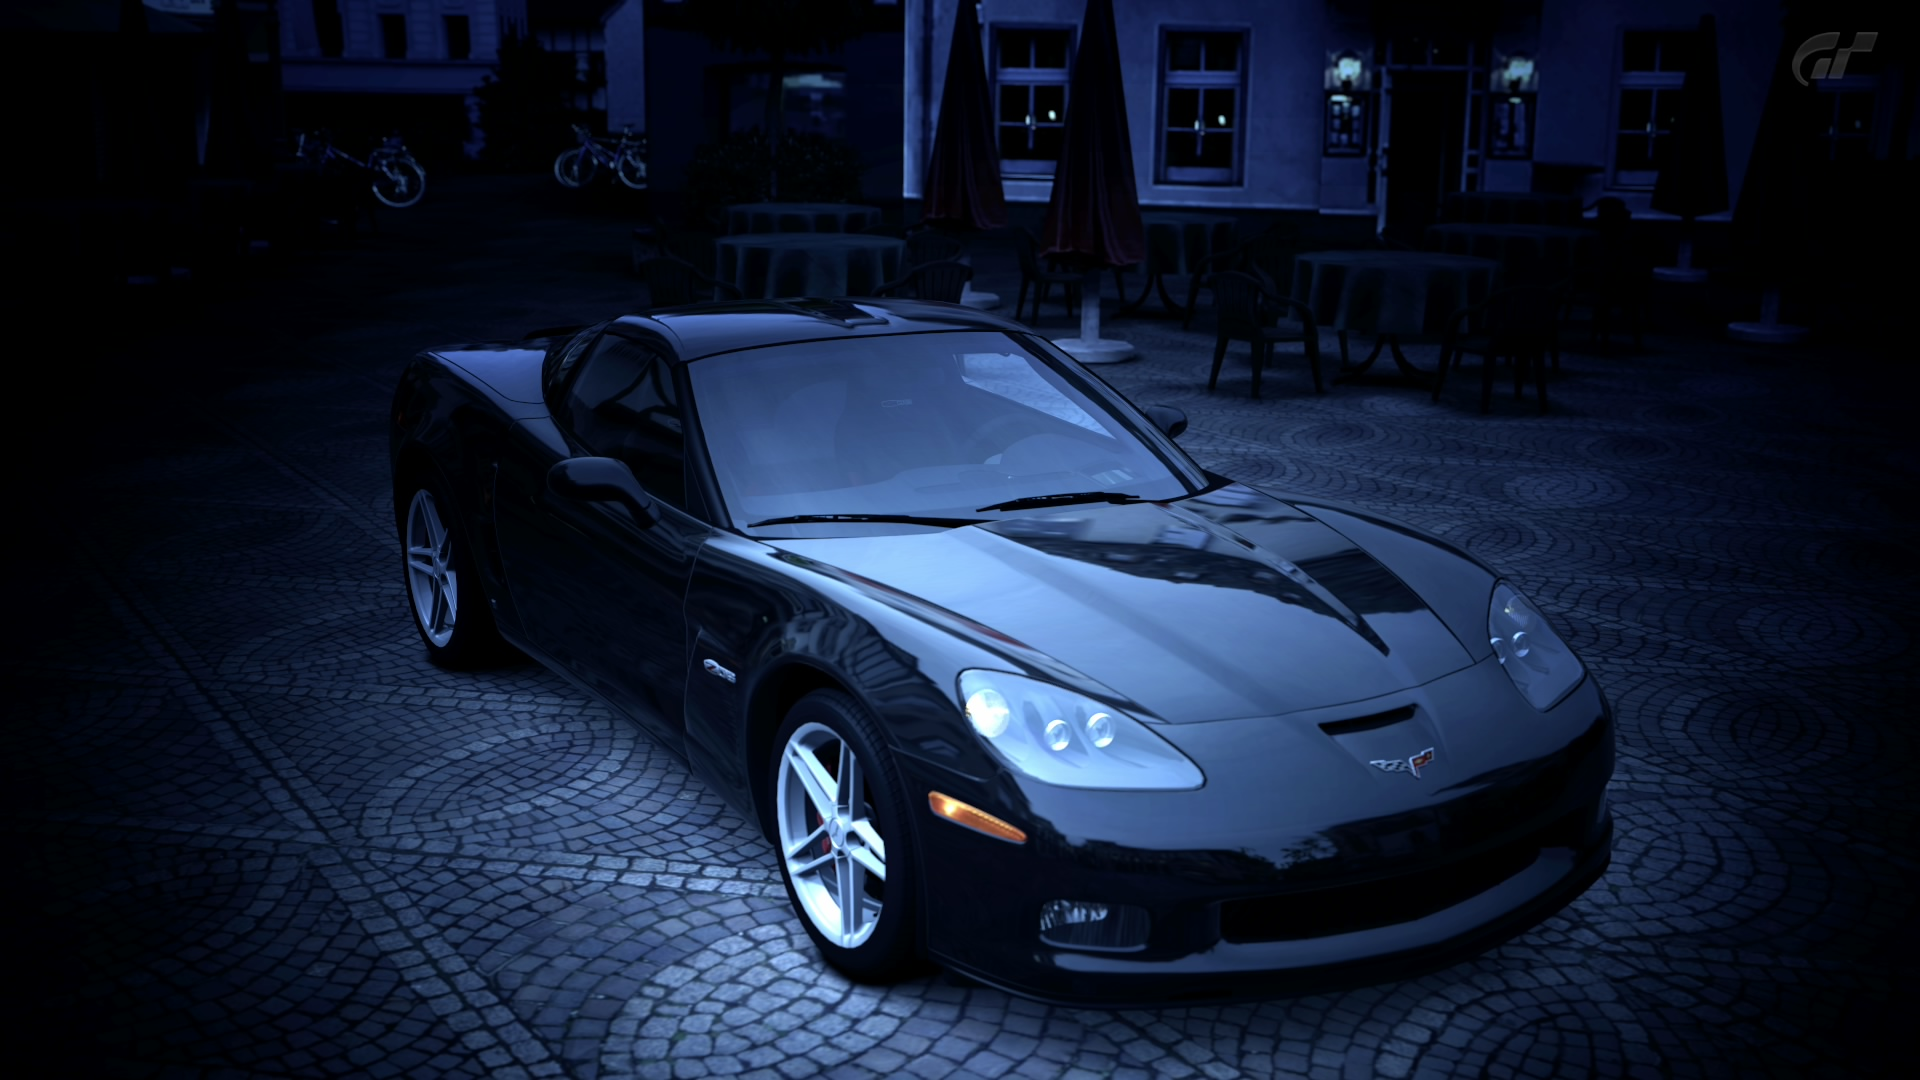 Corvette Z06 Wallpaper - Viewing Gallery